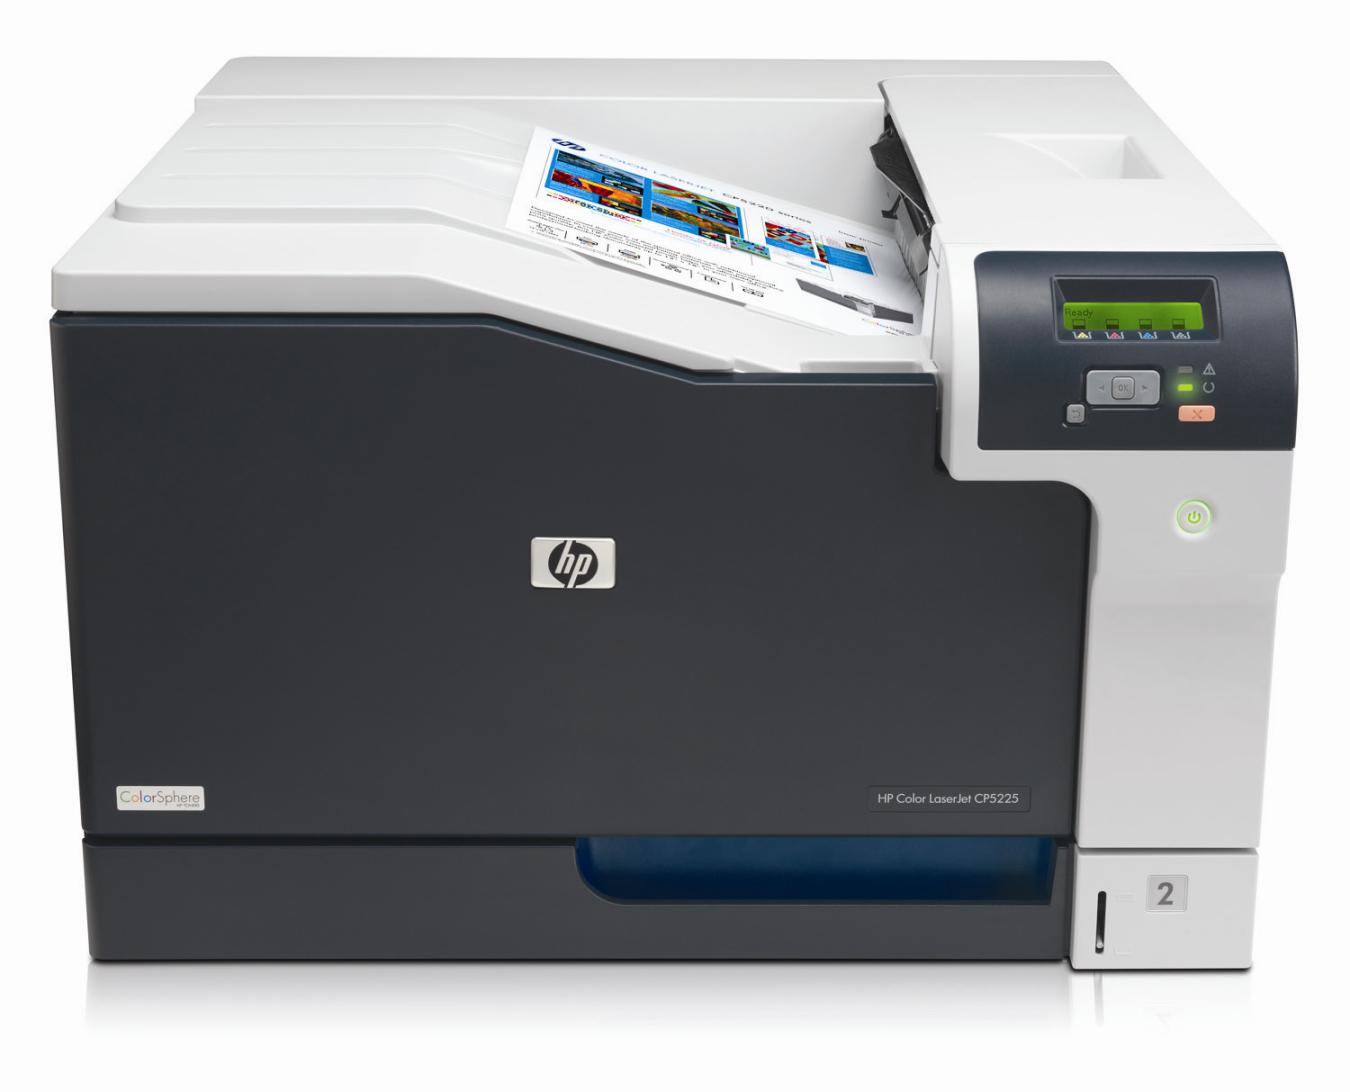 Color Laserjet CP5220